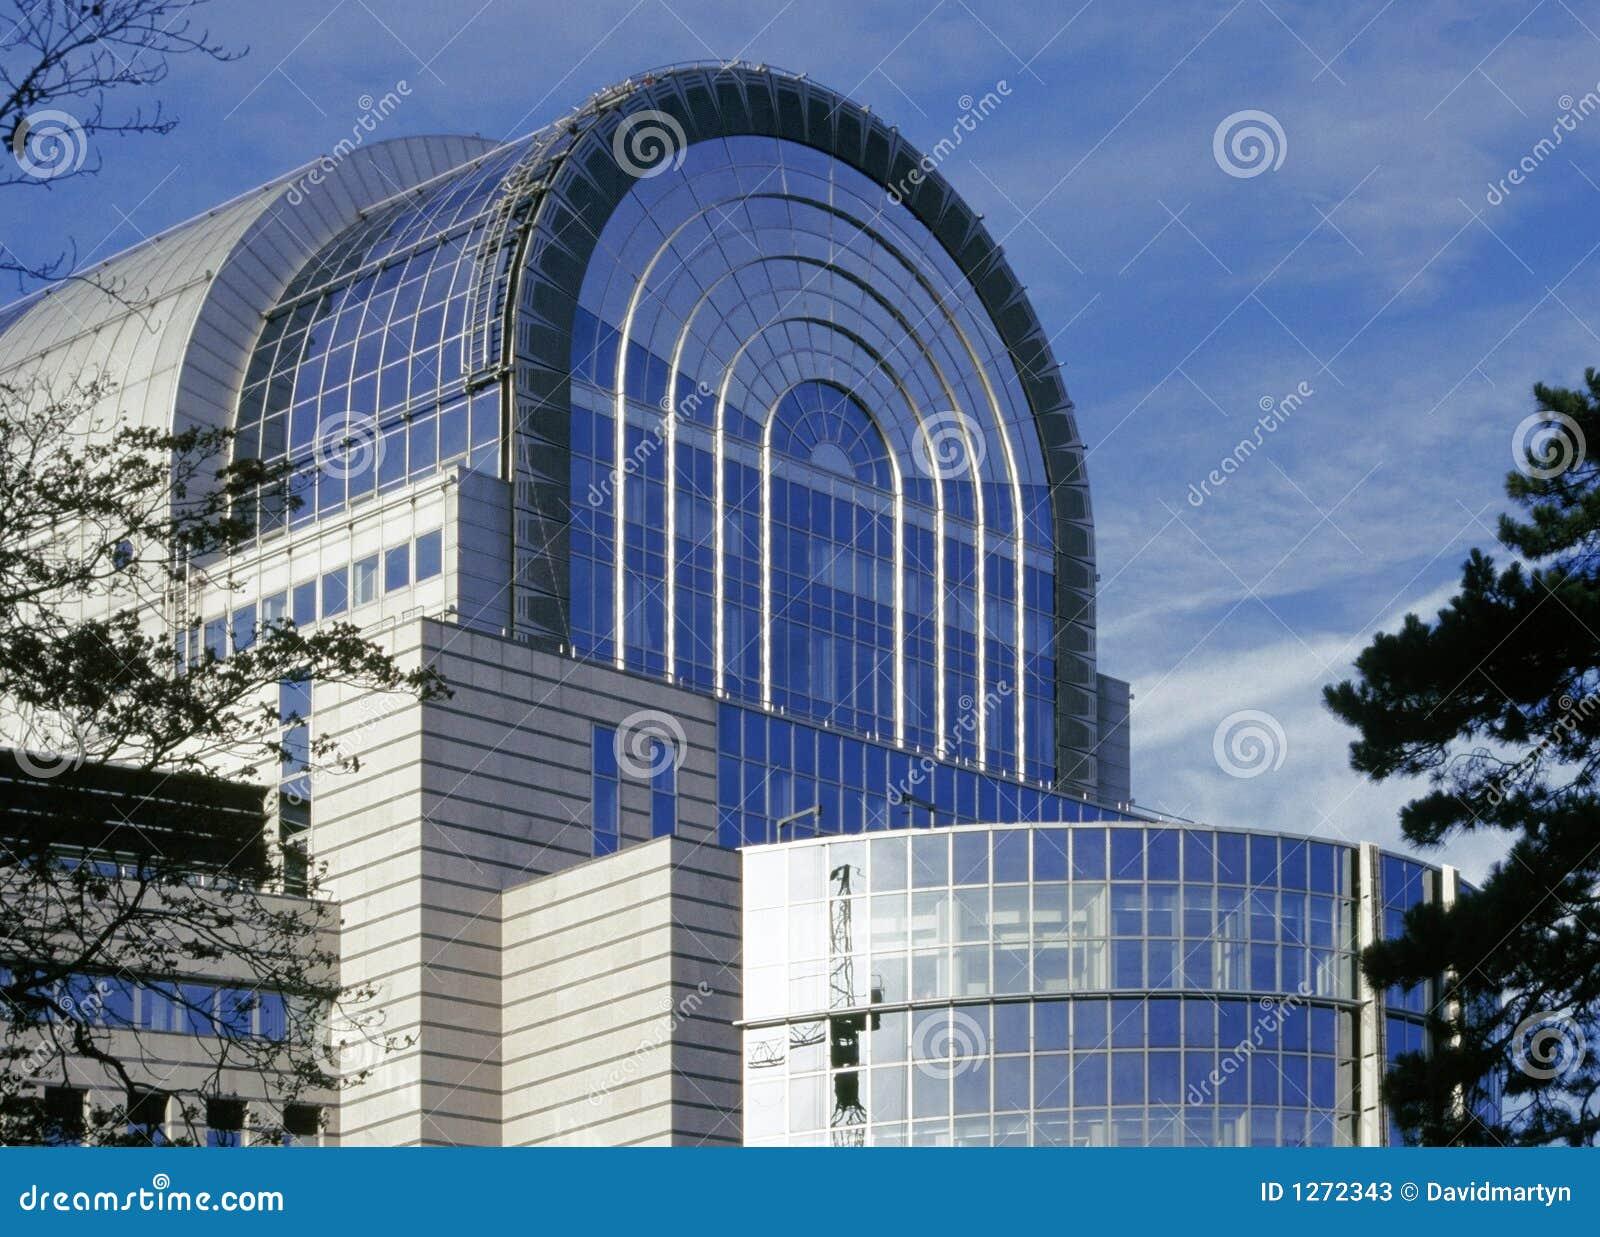 European Union Parliament Building Design